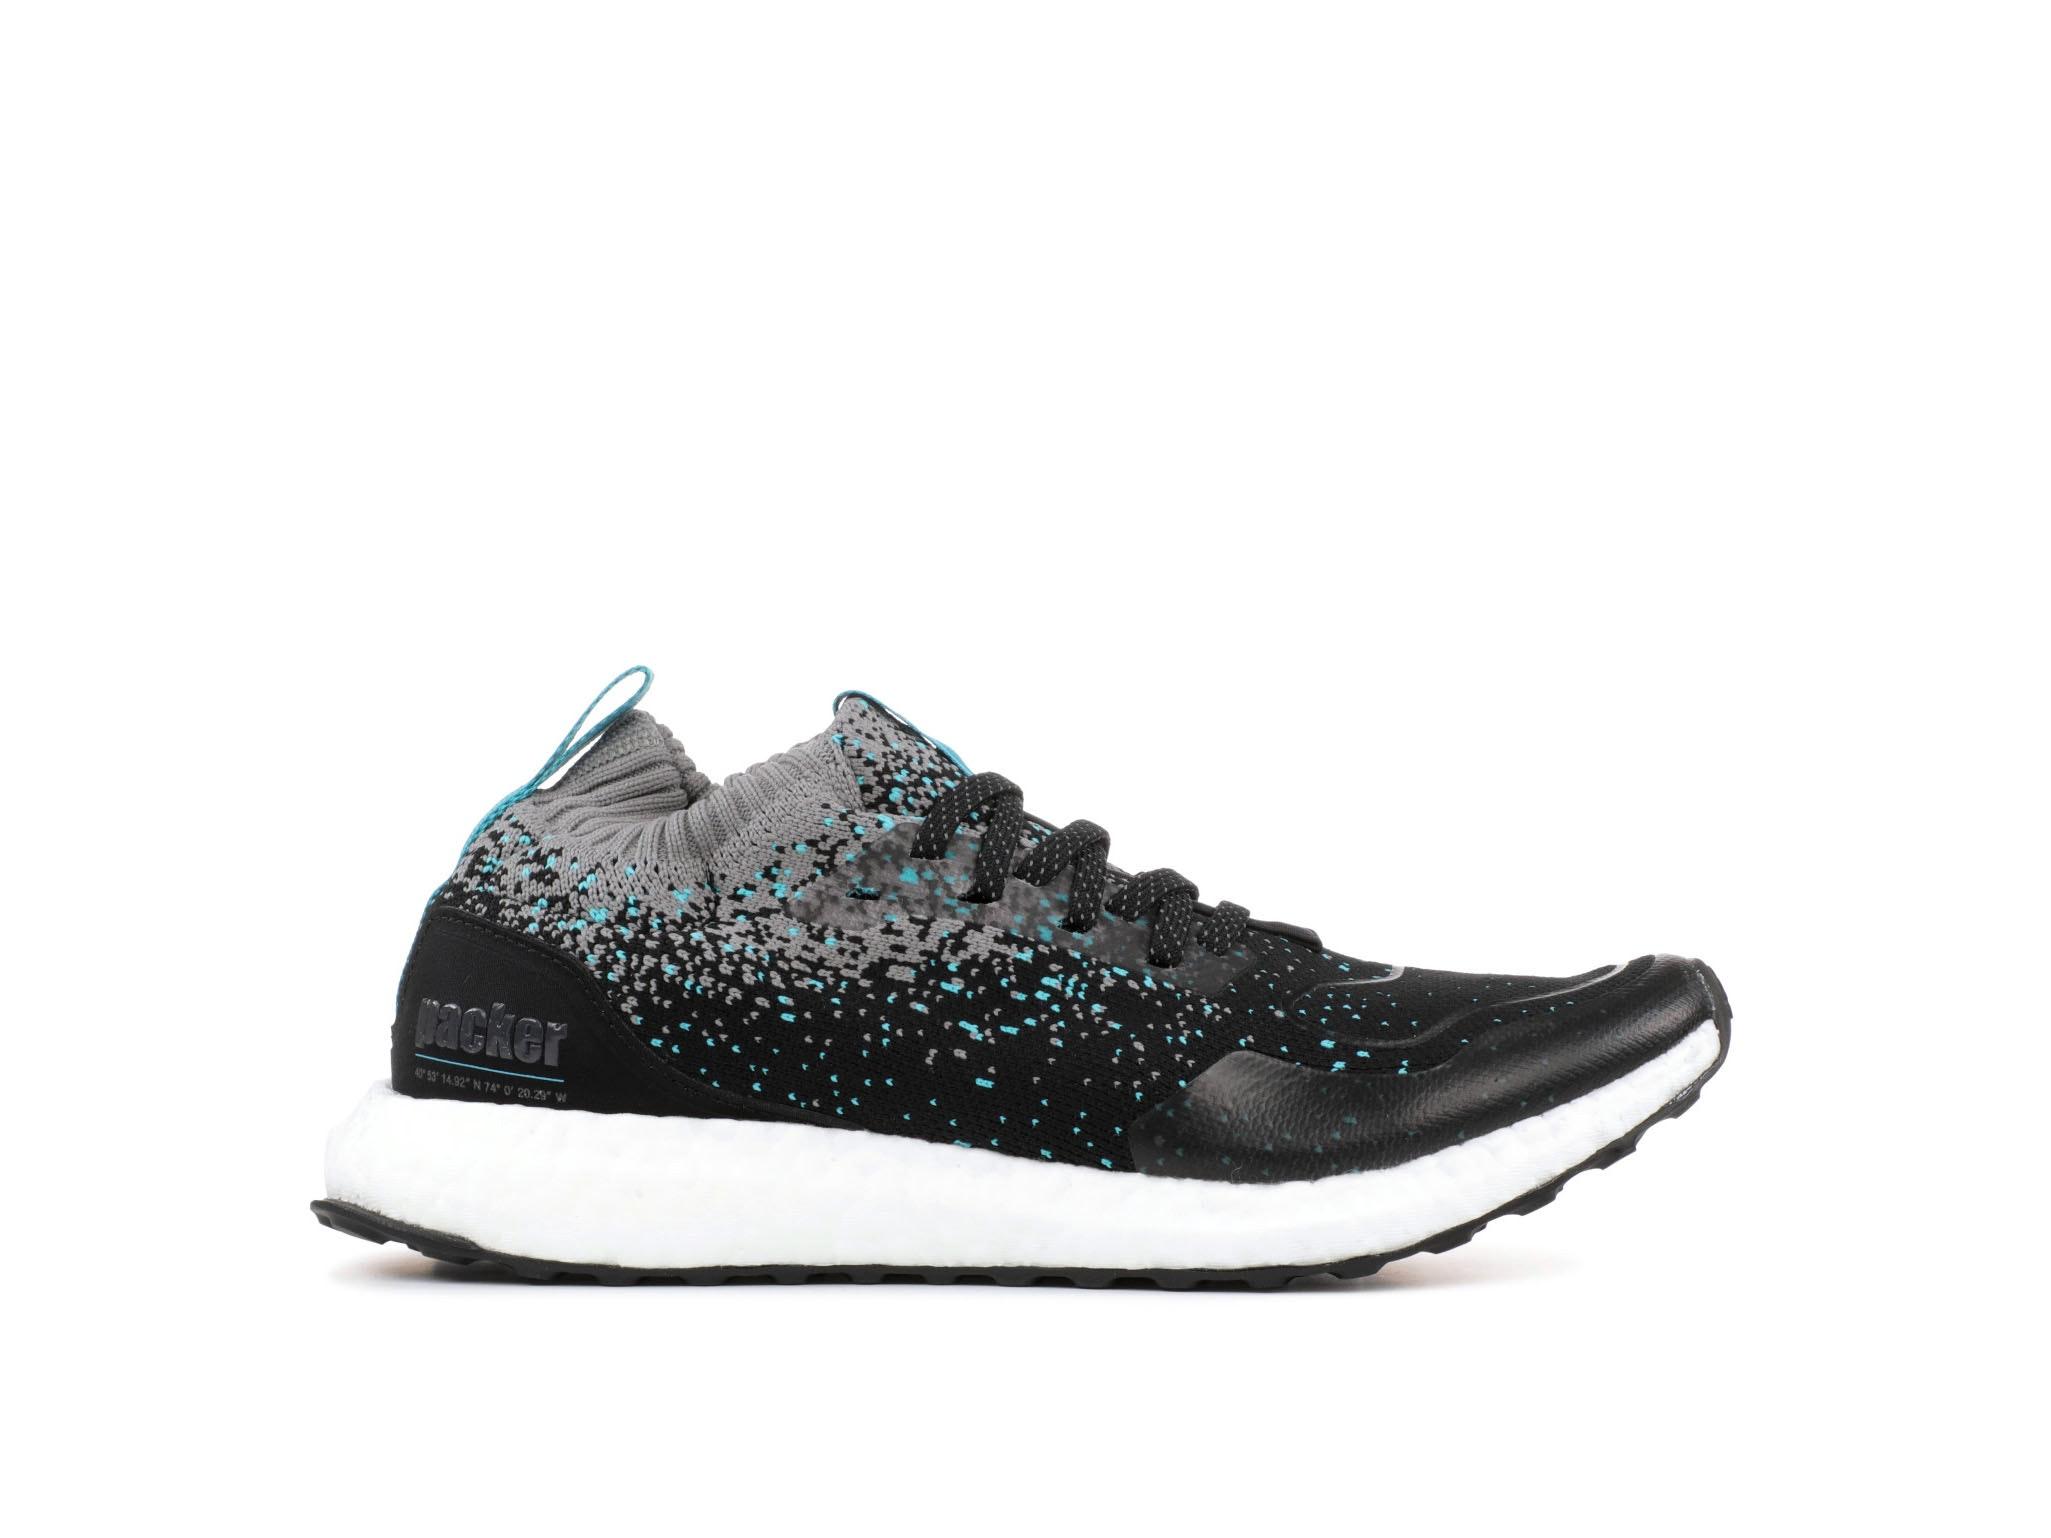 bb0211c04 Shop UltraBoost Mid x Packer Shoes x Shoebox Online